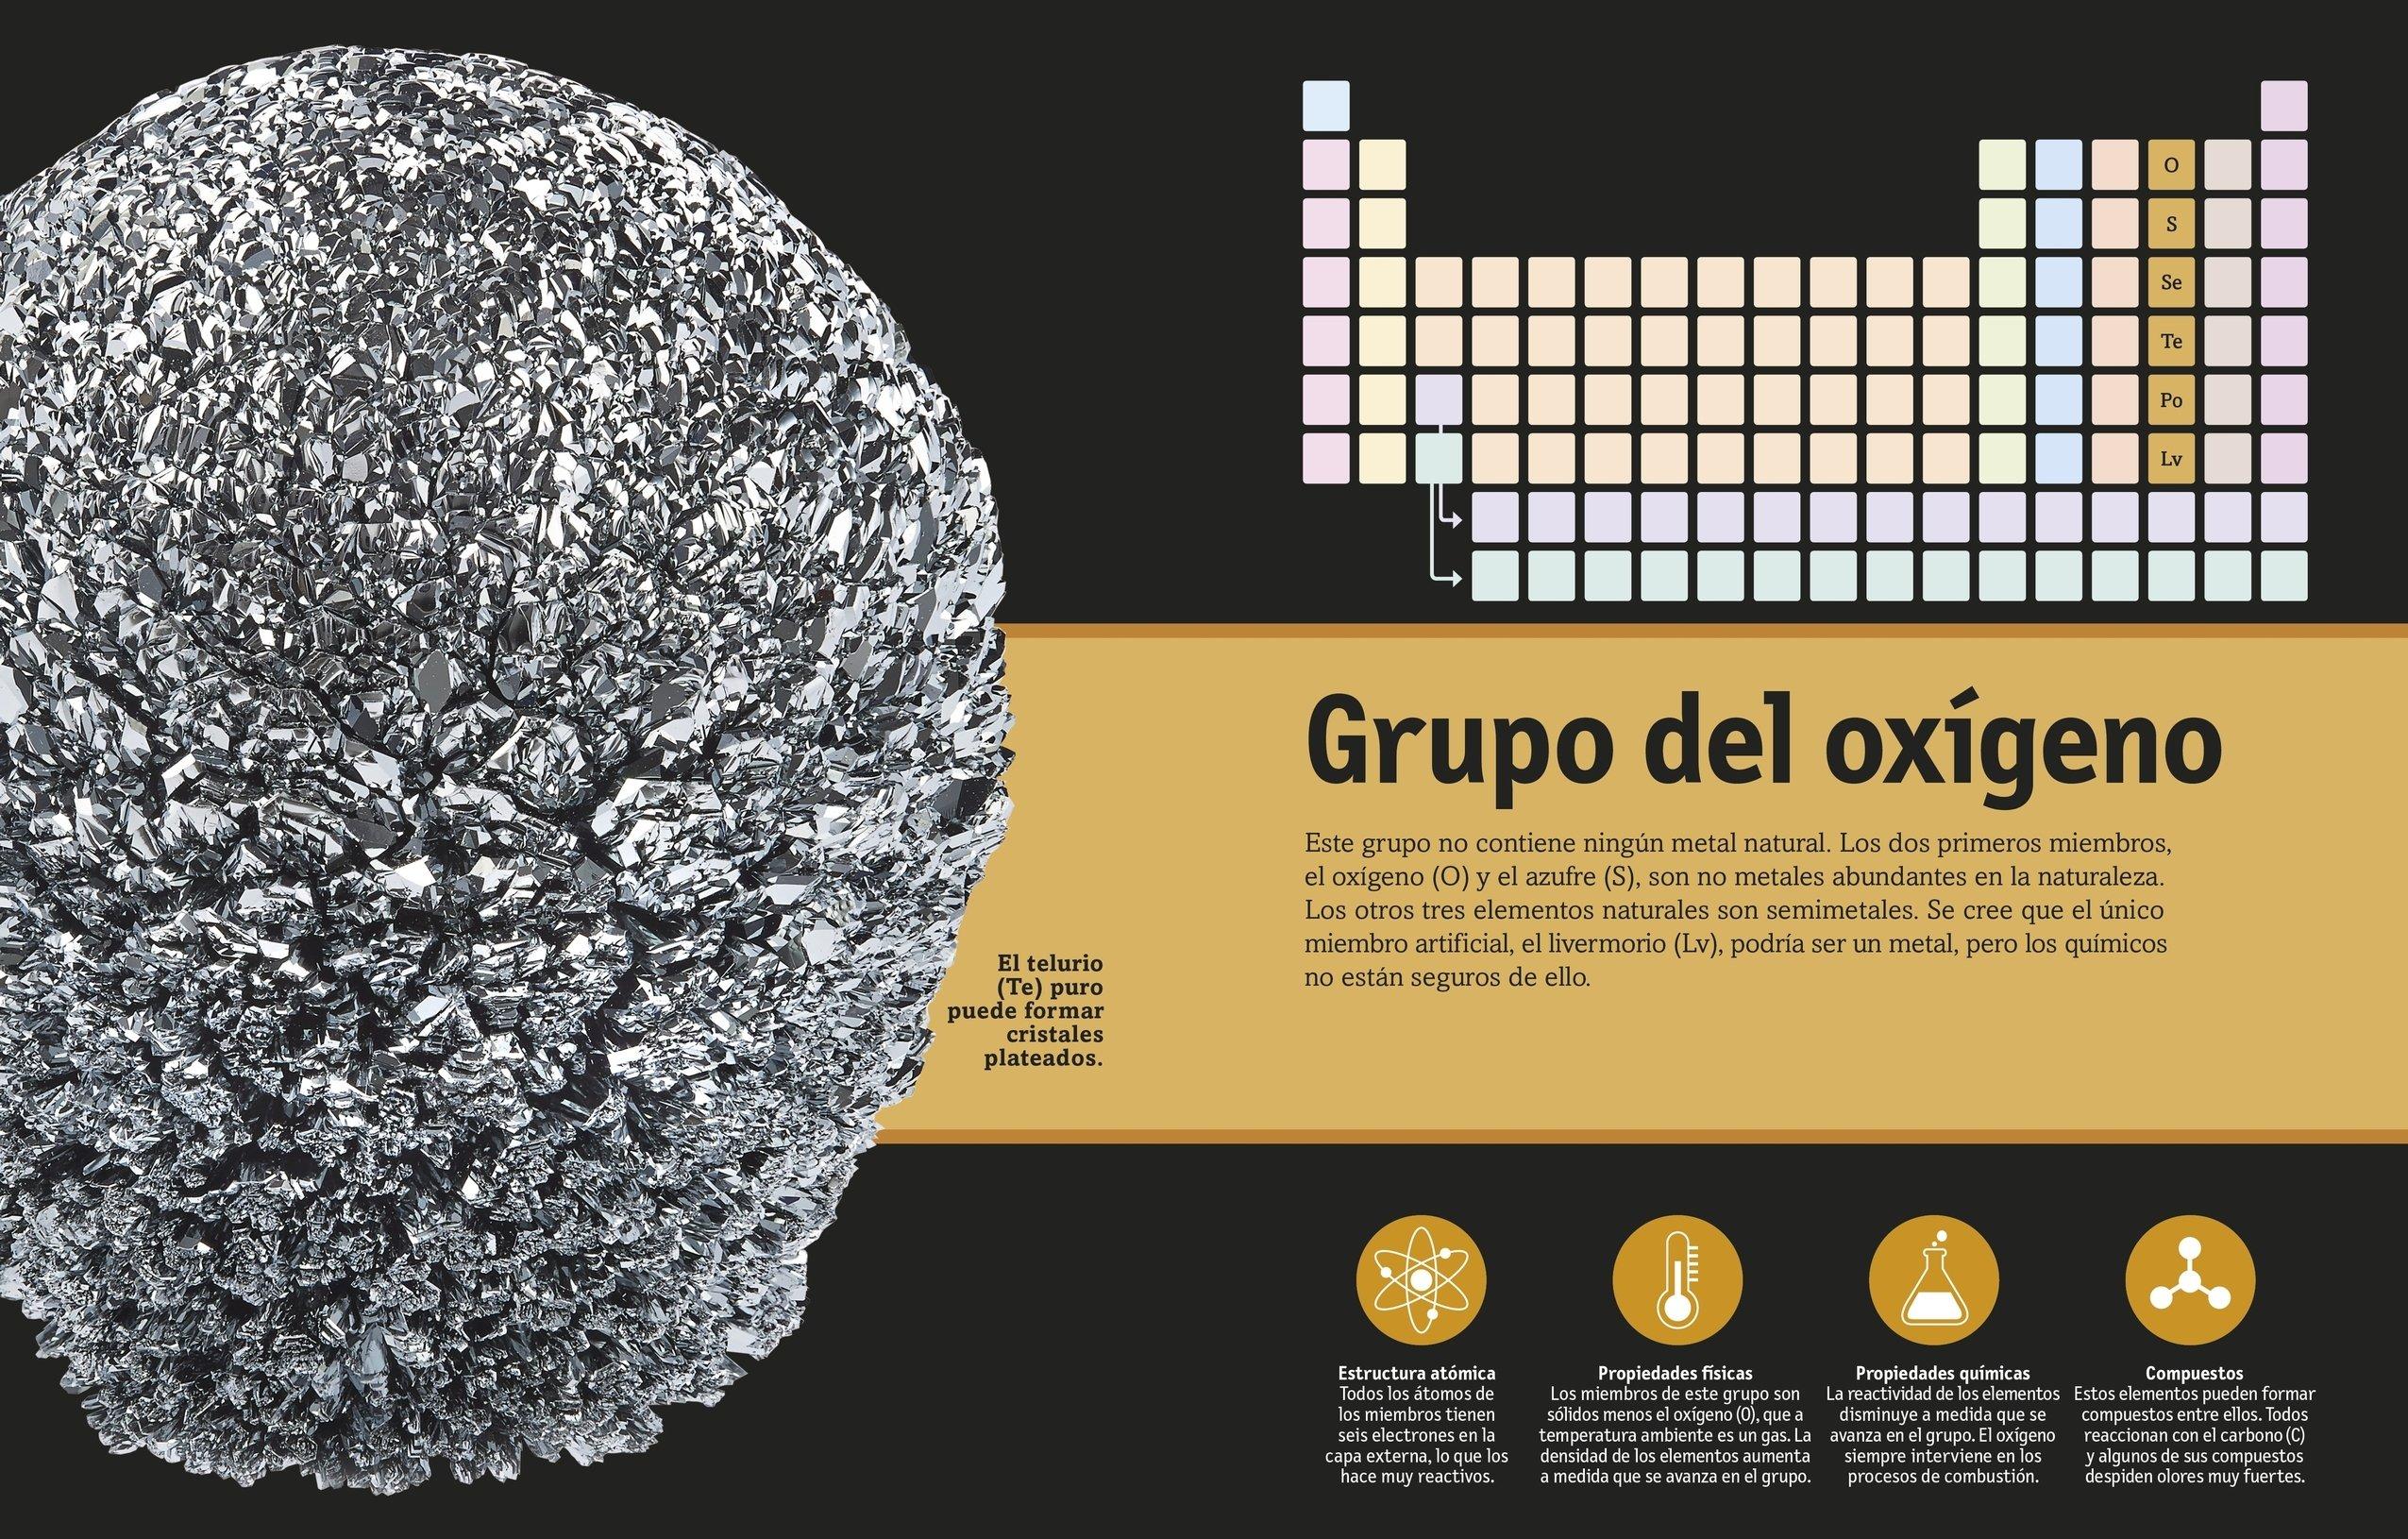 el libro de la tabla peridica spanish edition dk 9781465471765 amazoncom books